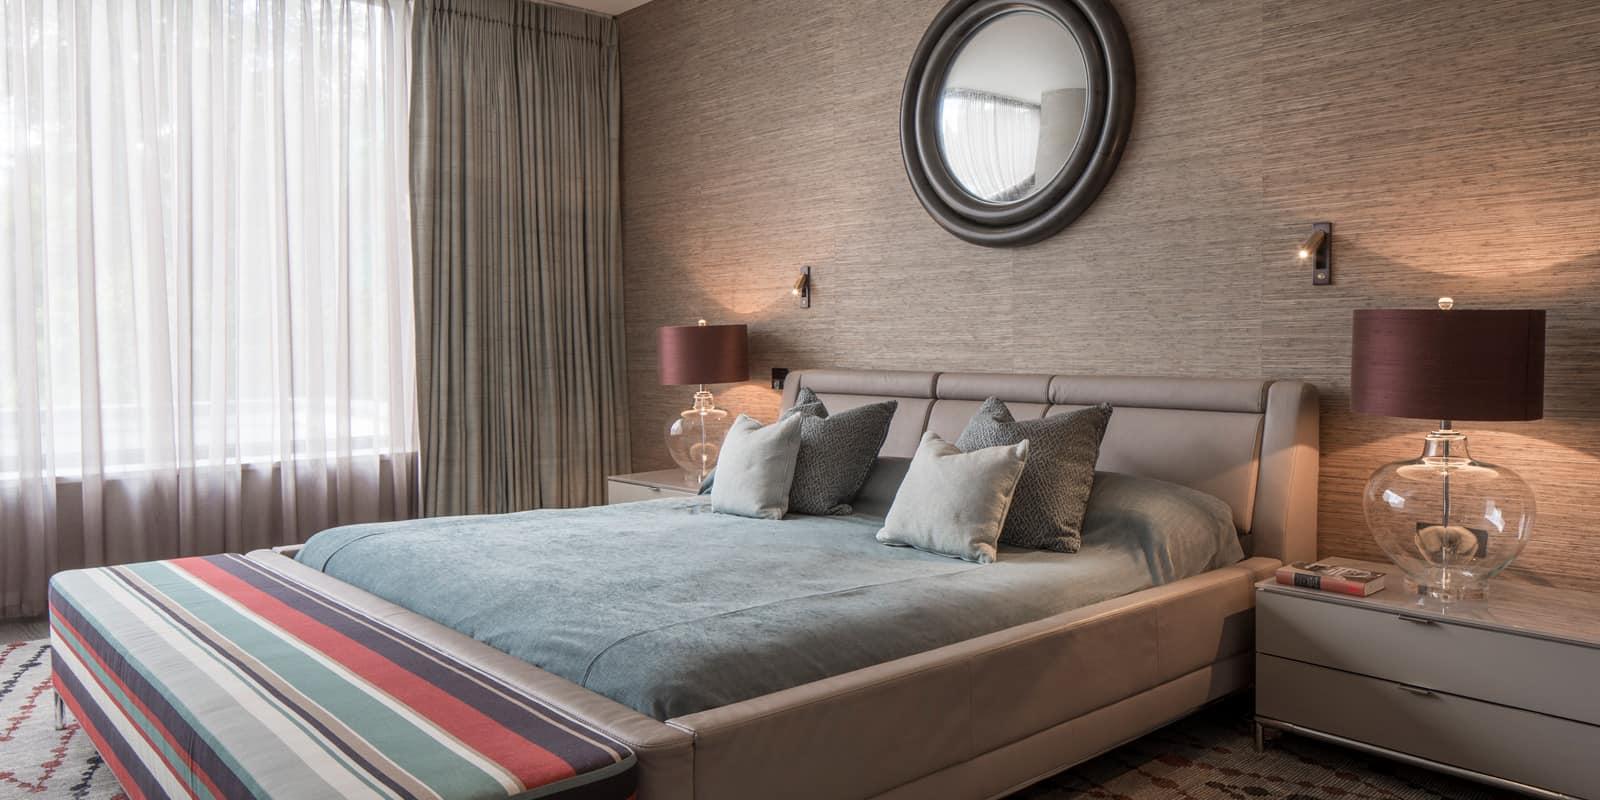 antrim grove master bedroom roselind wilson design